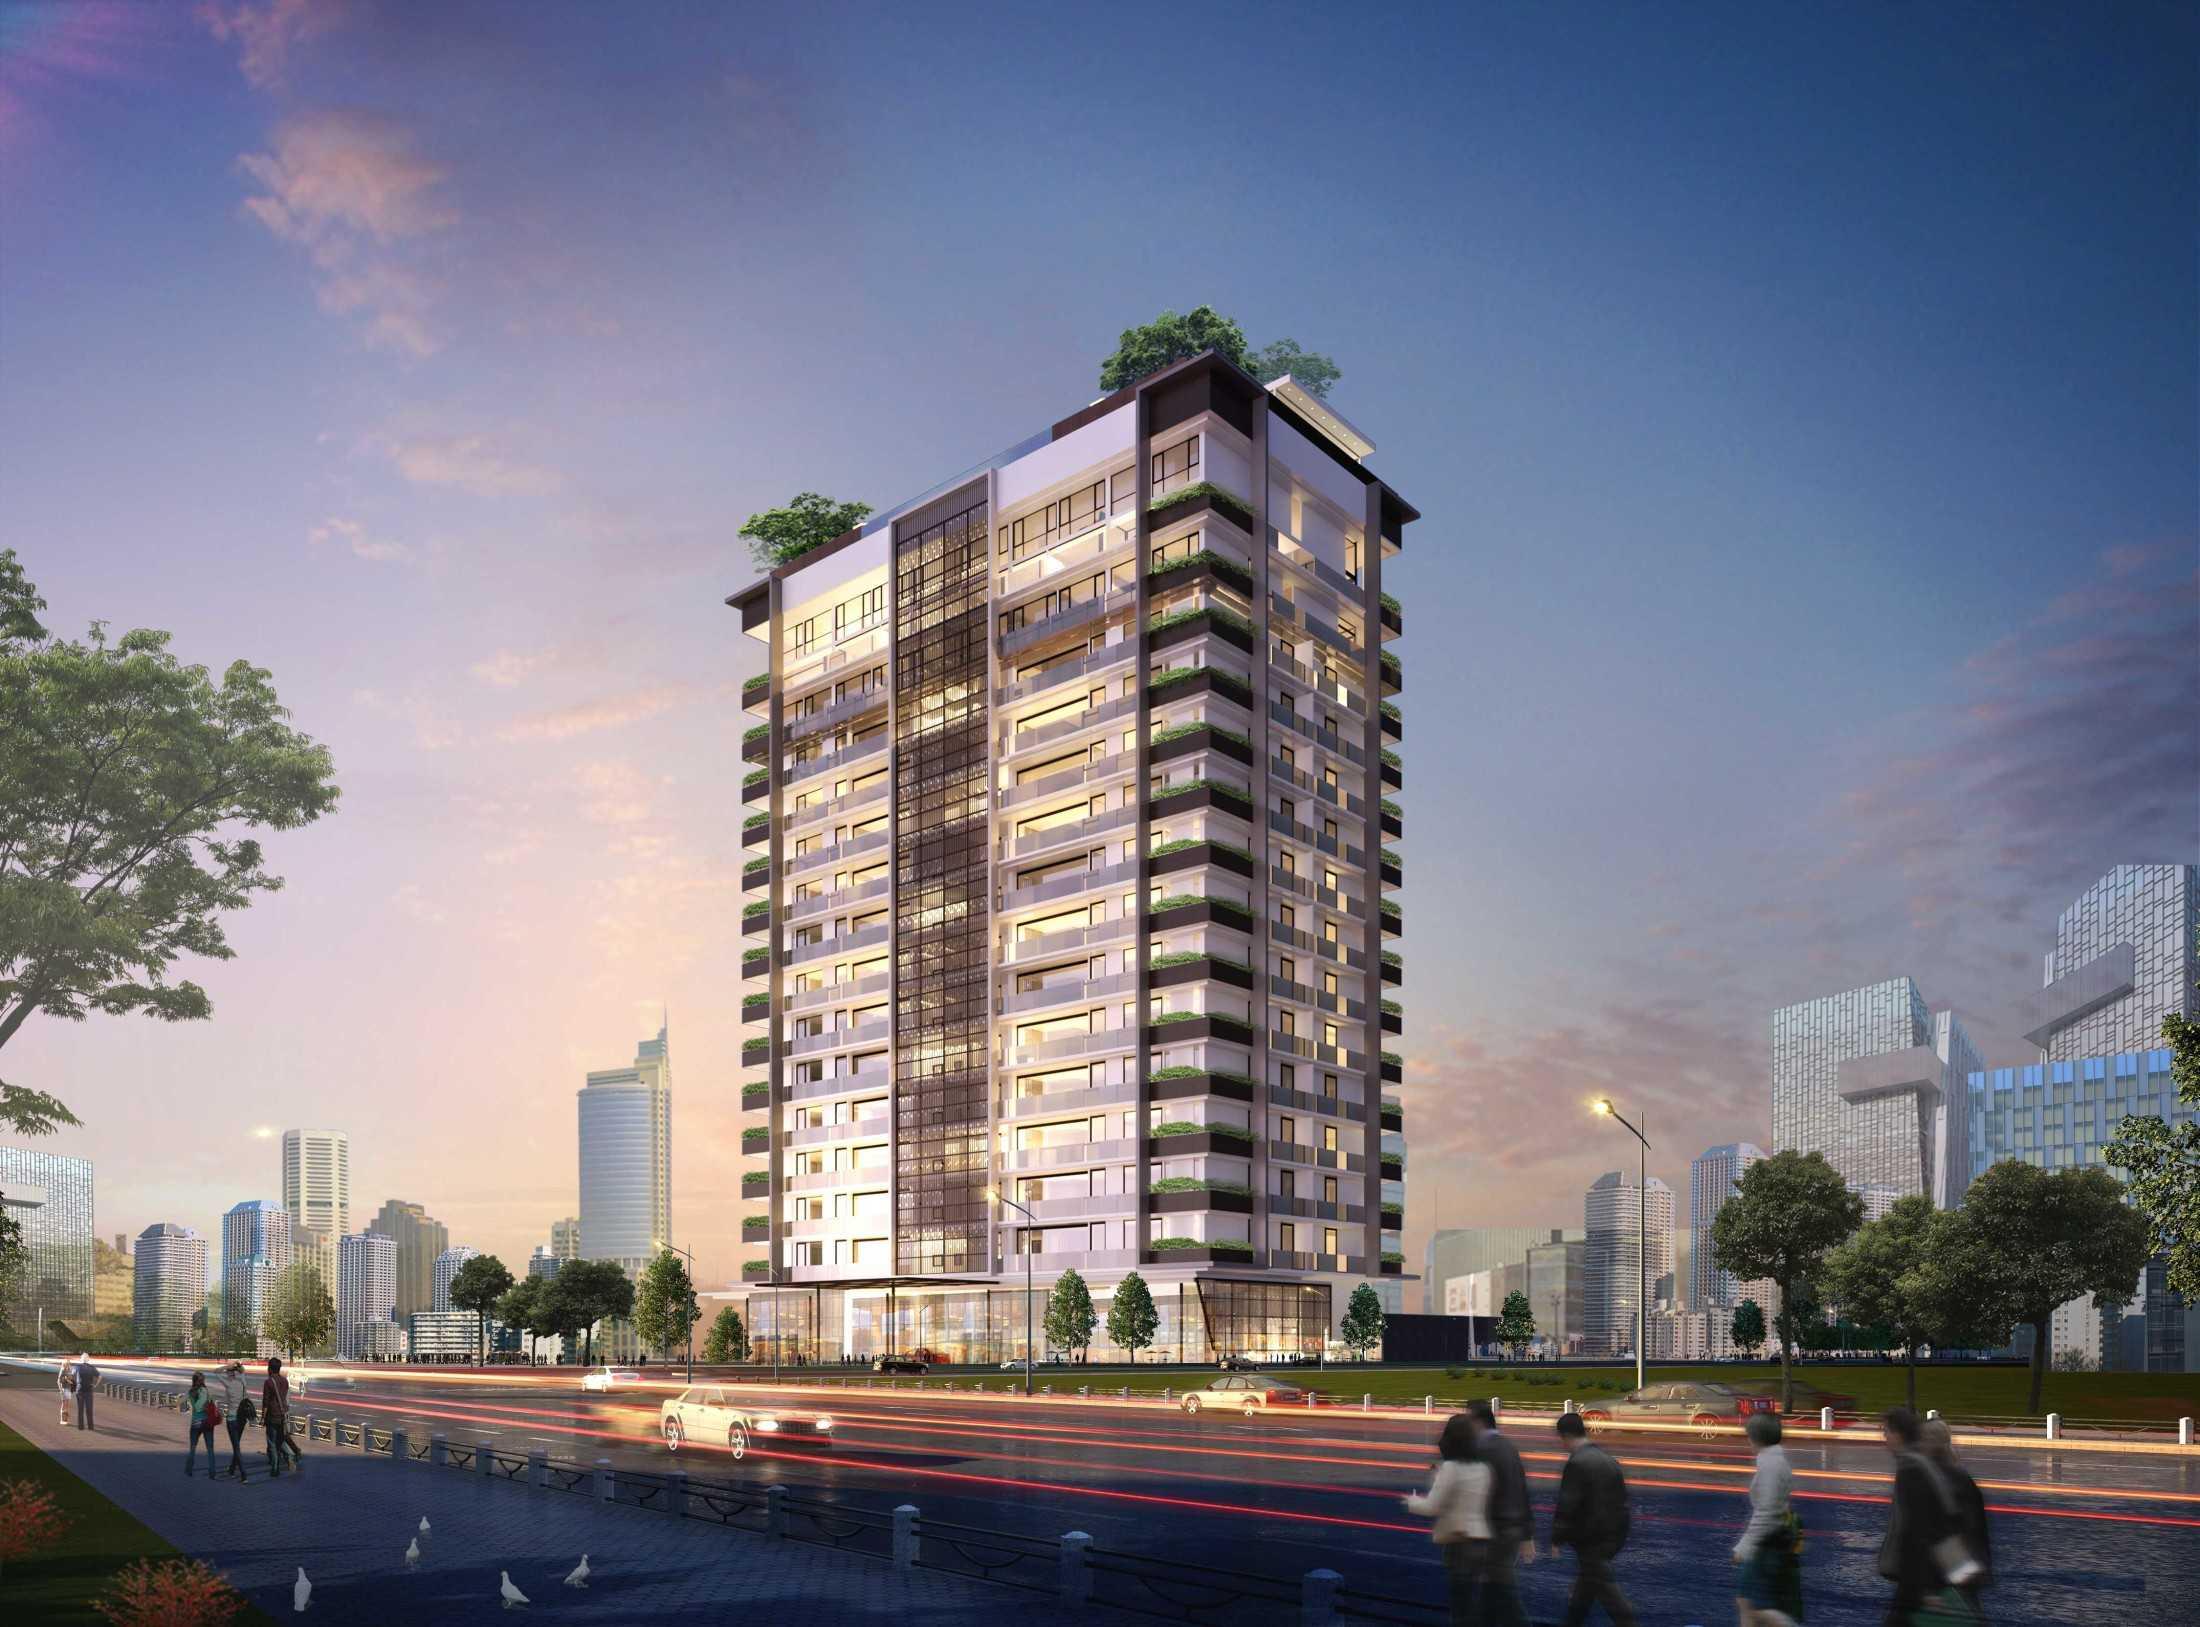 Gohte Architects The Attala 14460, Indonesia 14460, Indonesia Gohte-Architects-The-Attala  96601